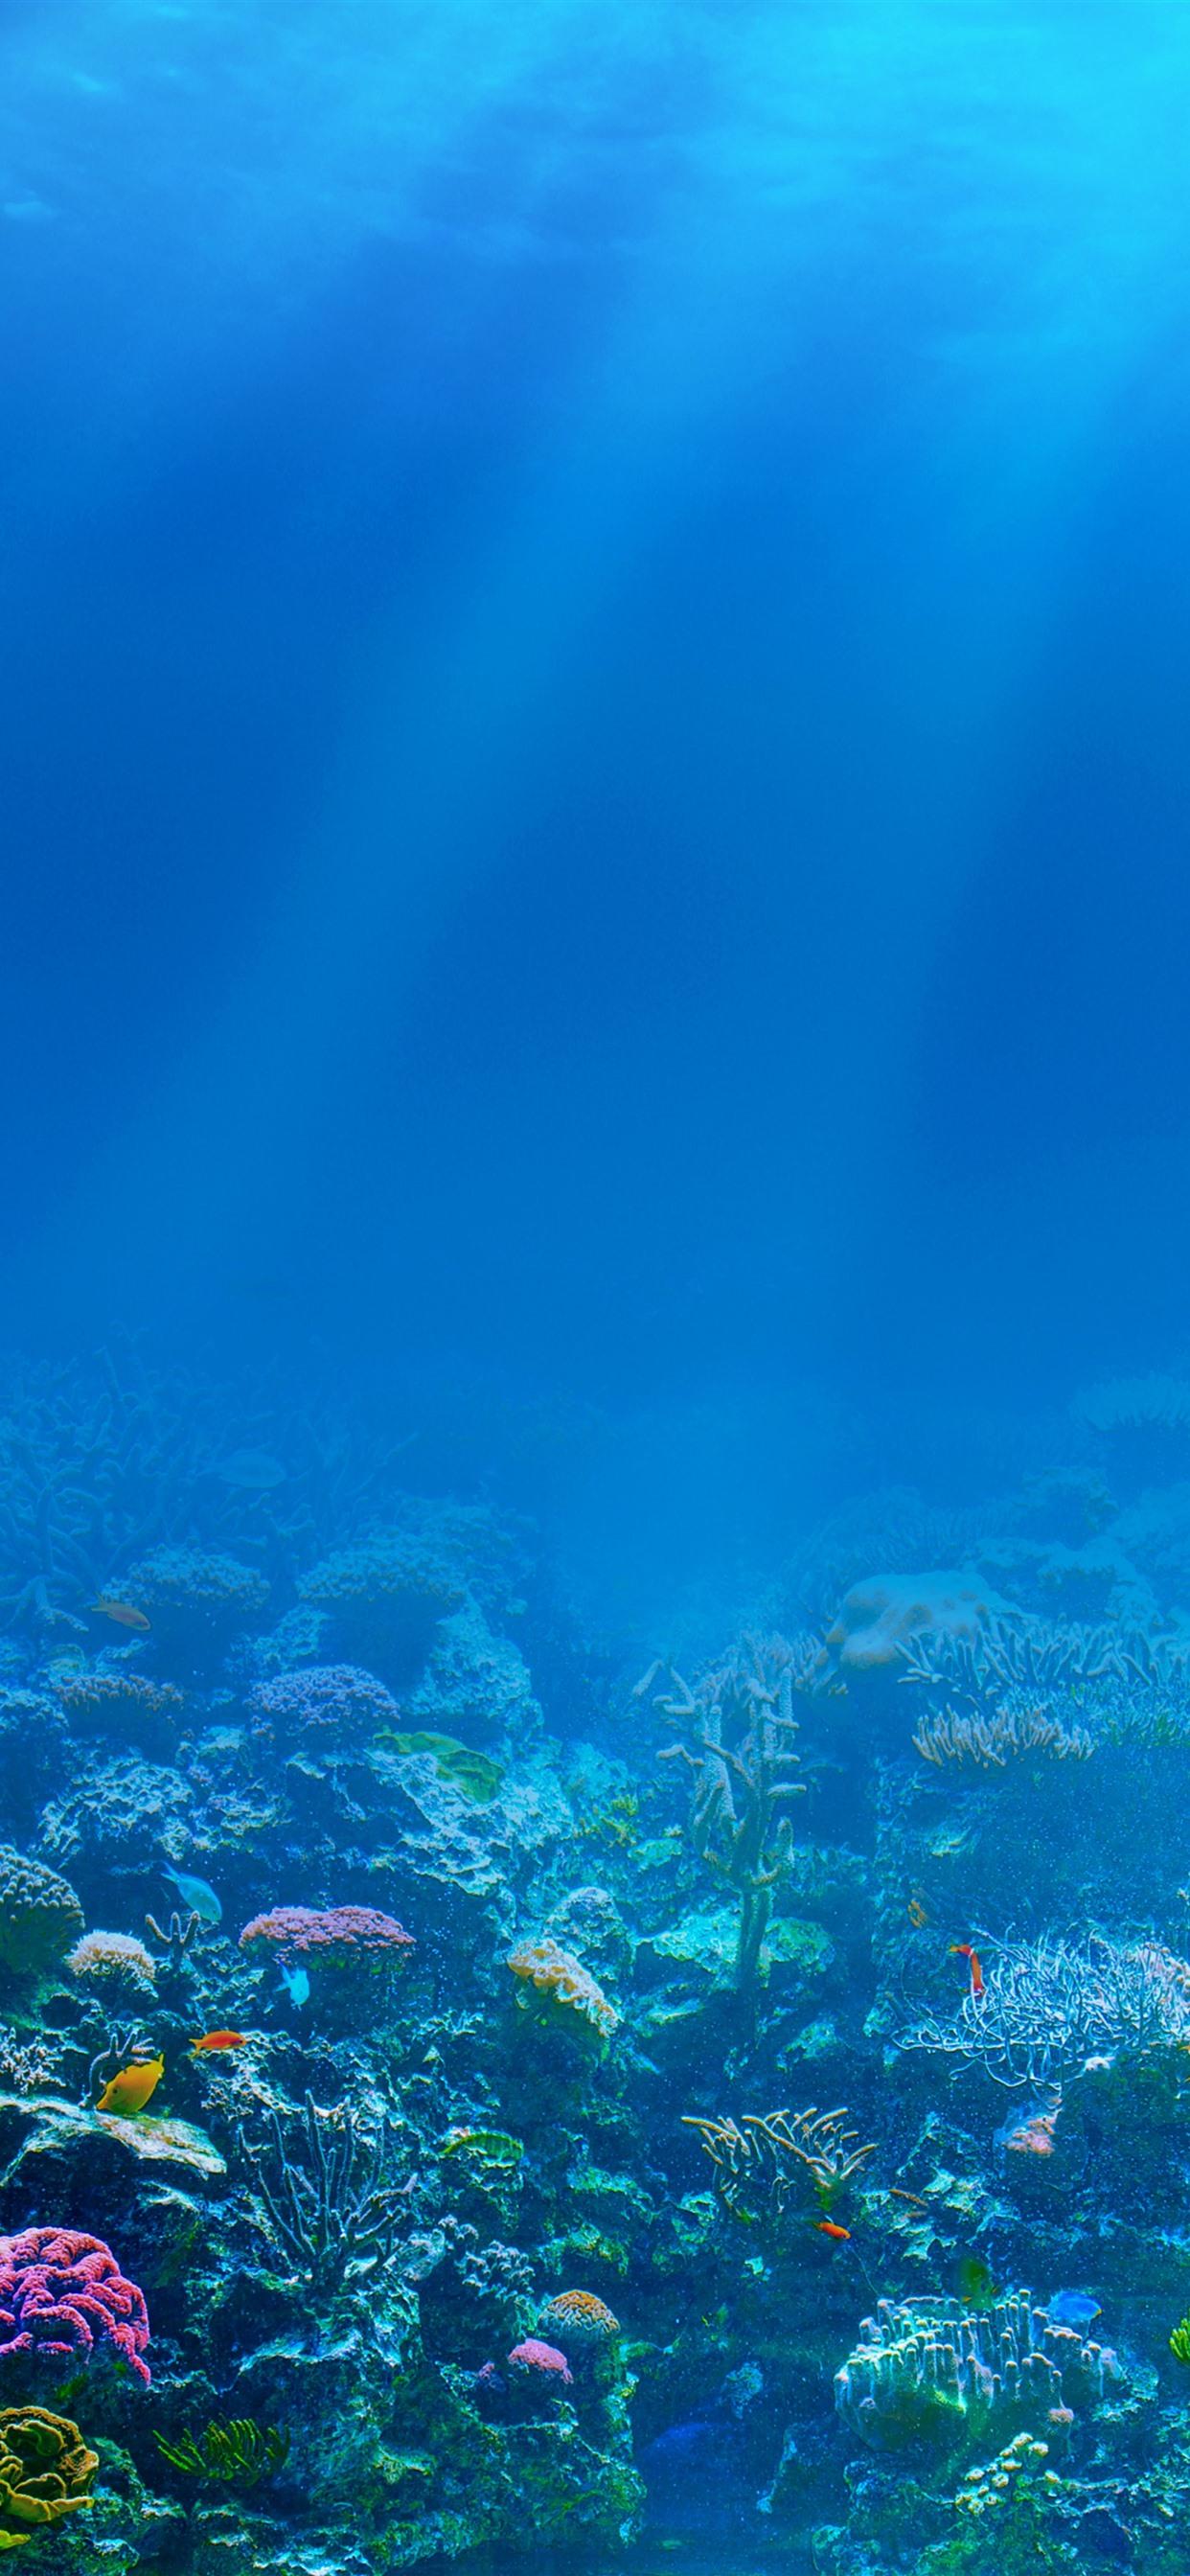 Blue Sea Underwater Sun Rays Fish Coral 1242x2688 Iphone